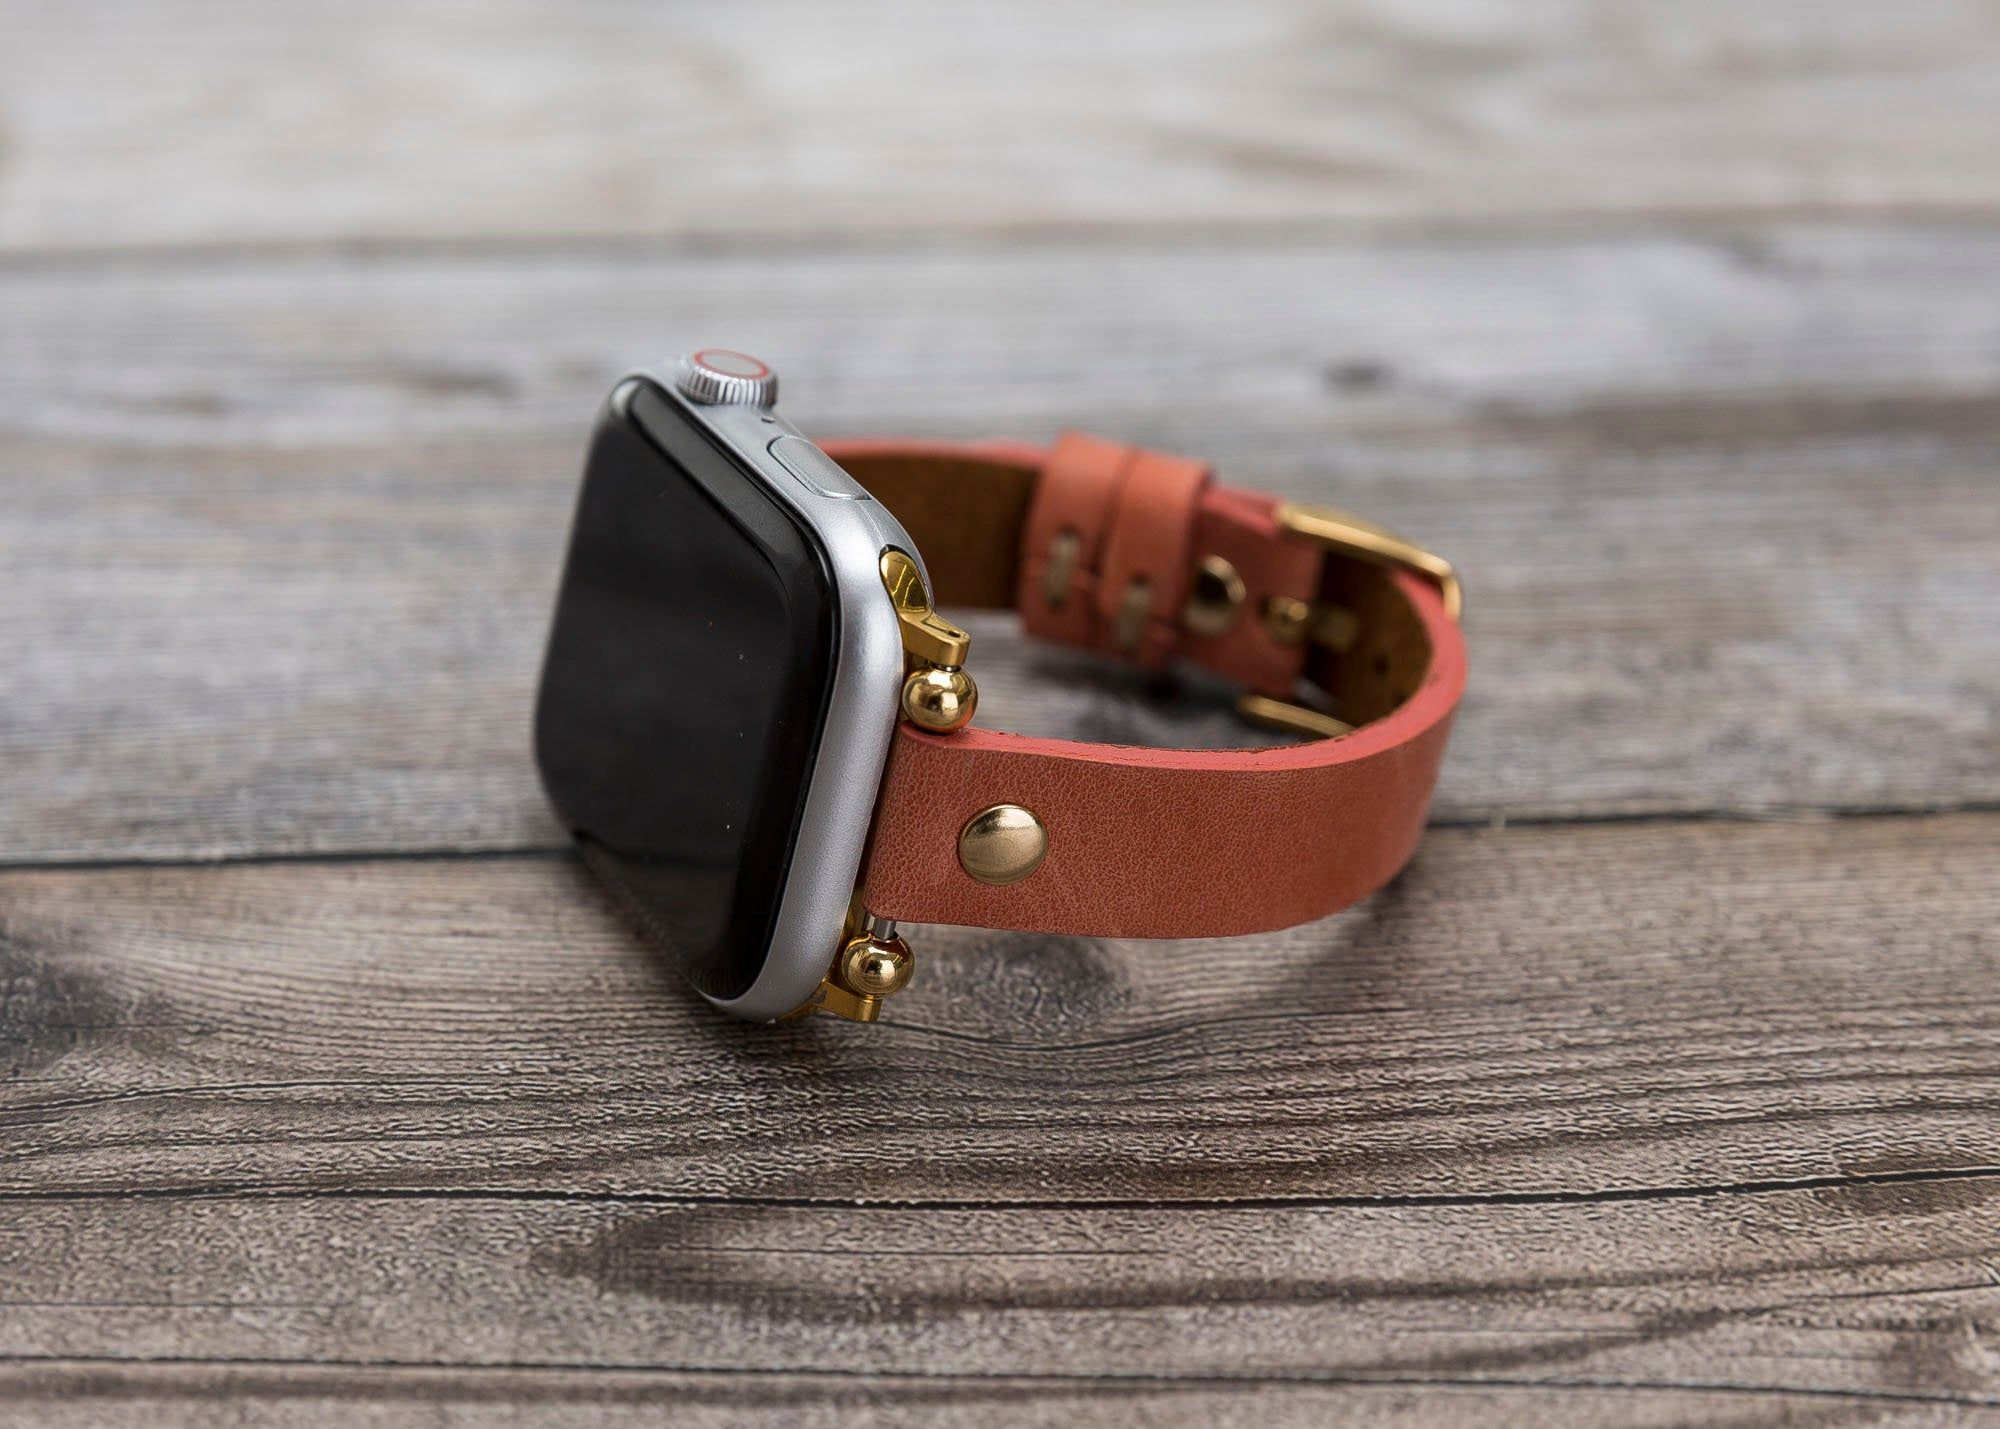 Leather Slim Apple Watch Band 38mm 40mm Women Apple Watch Etsy Apple Watch Bands Leather 38mm Apple Watch Band Apple Watch Leather